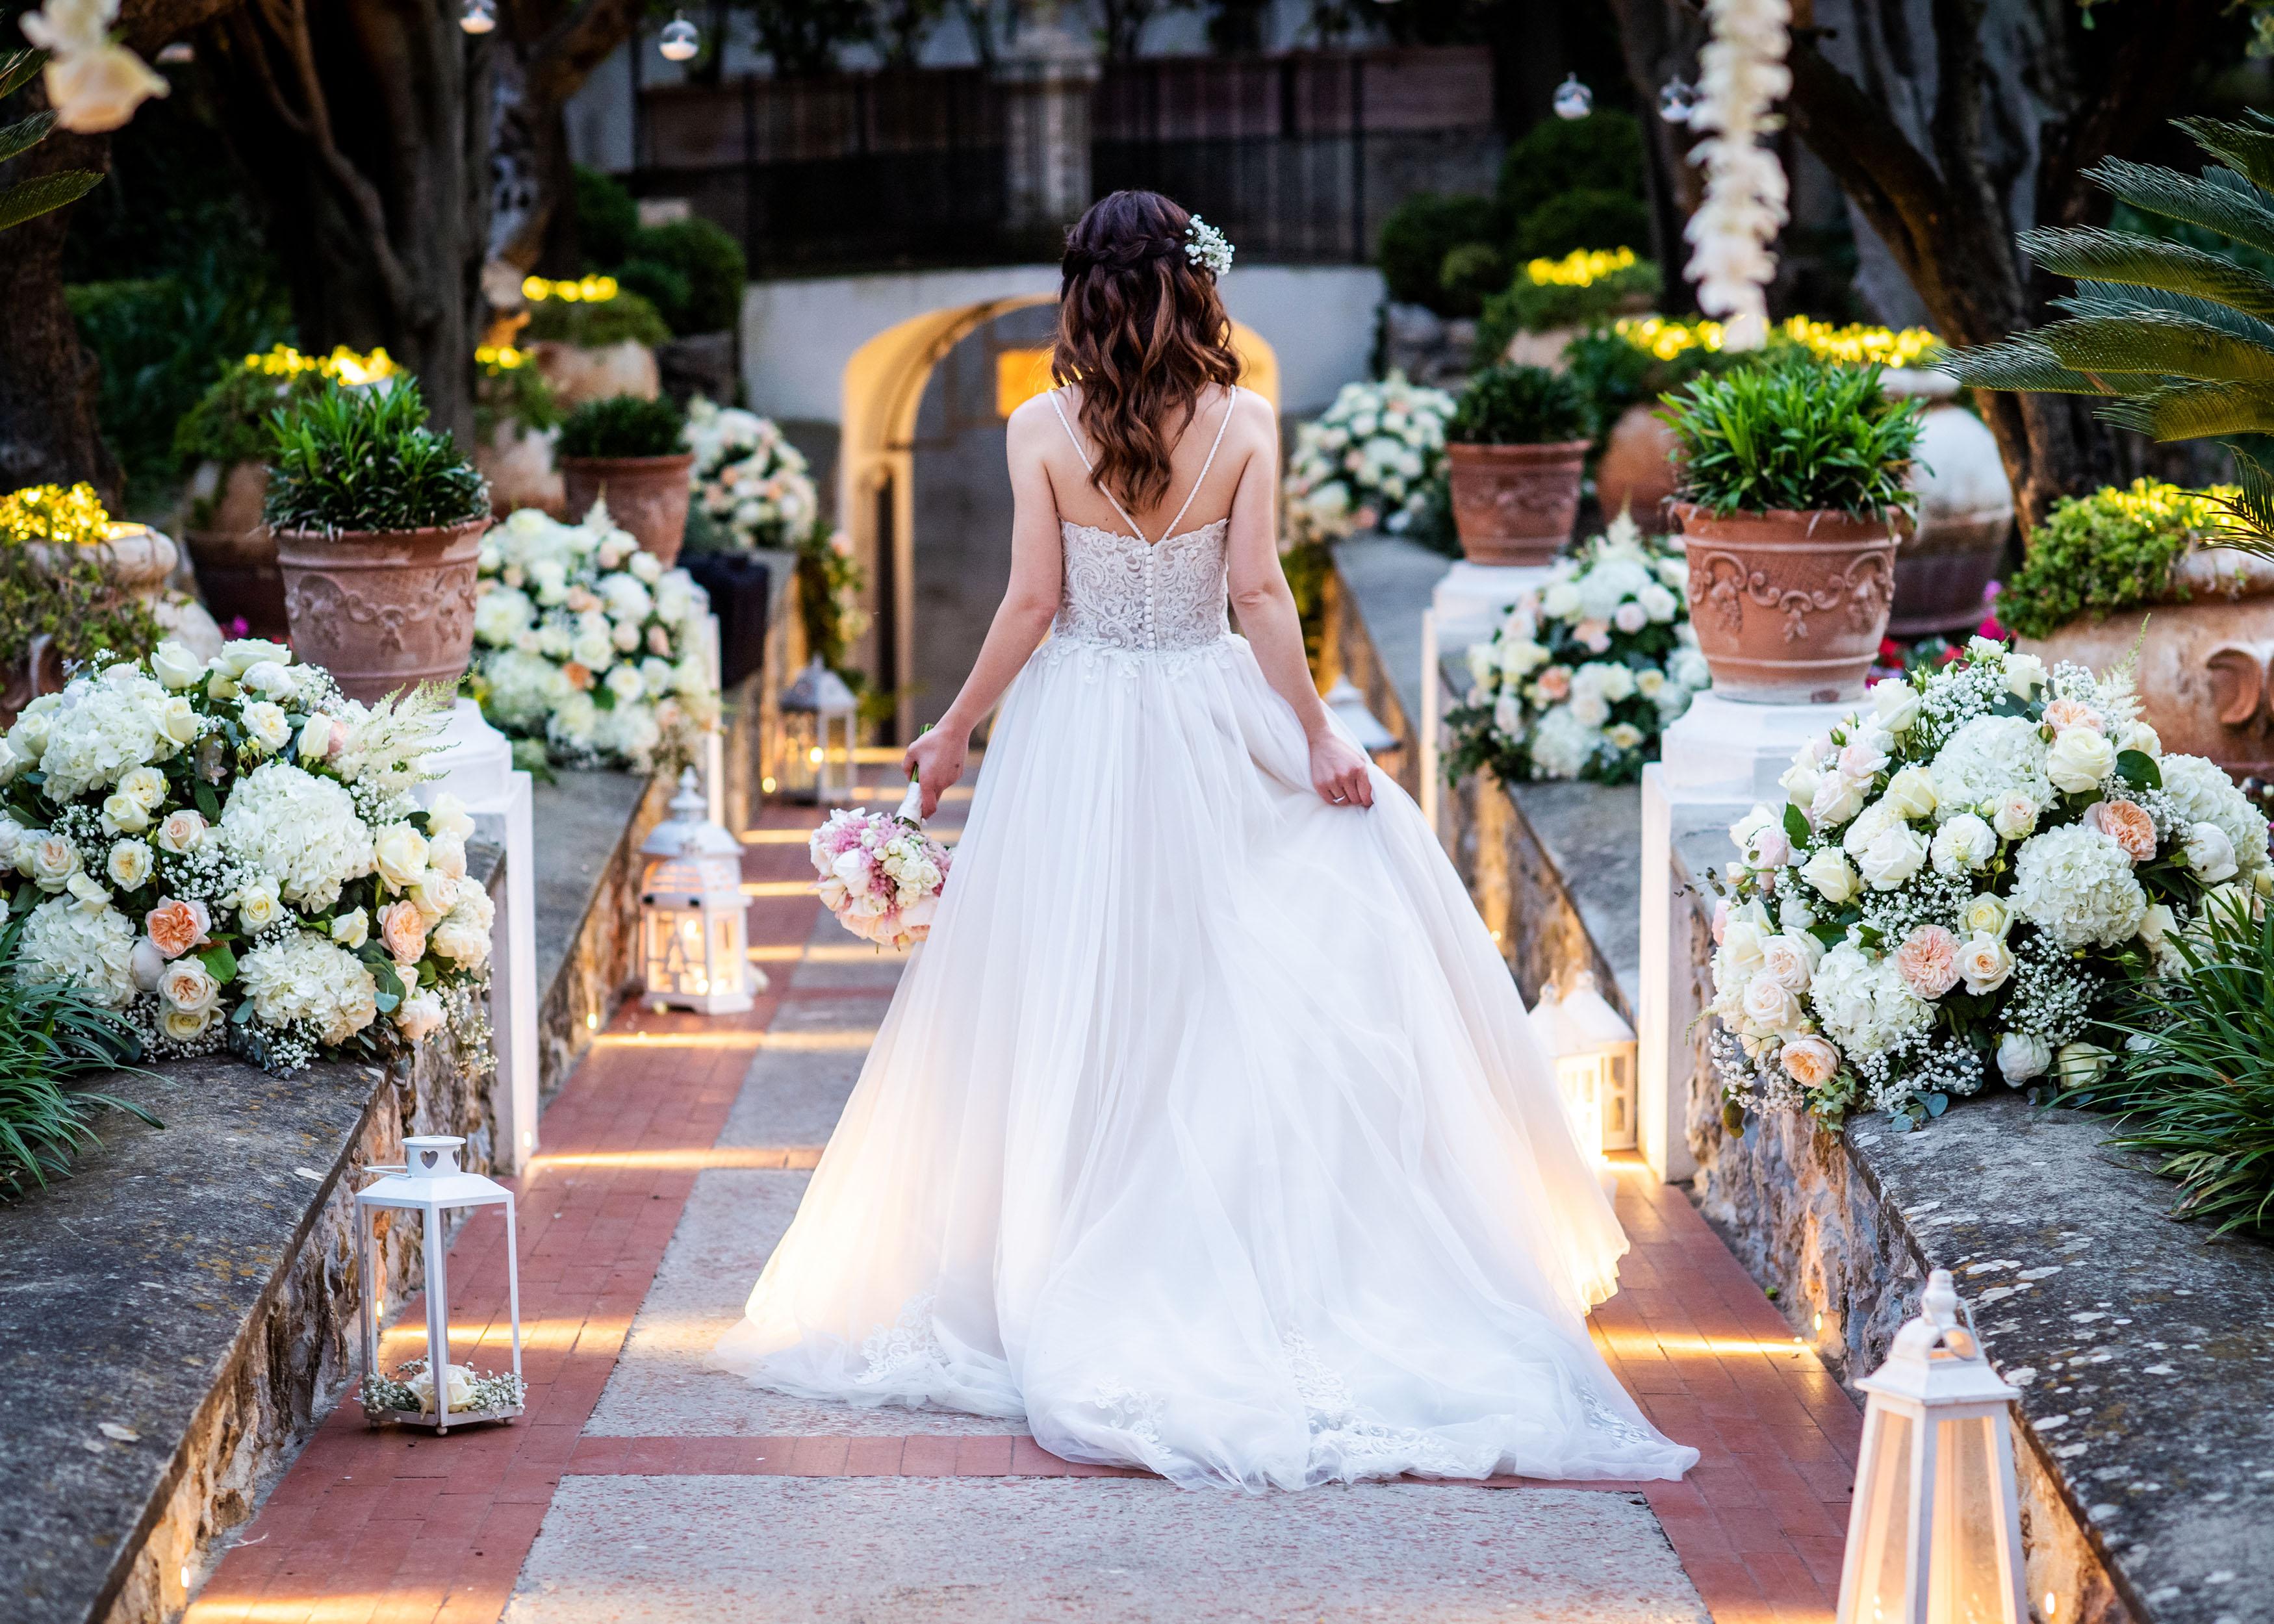 https://www.weddingamalfi.com/wp-content/uploads/Katia-Jorge-18-maggio-2019-41.jpg